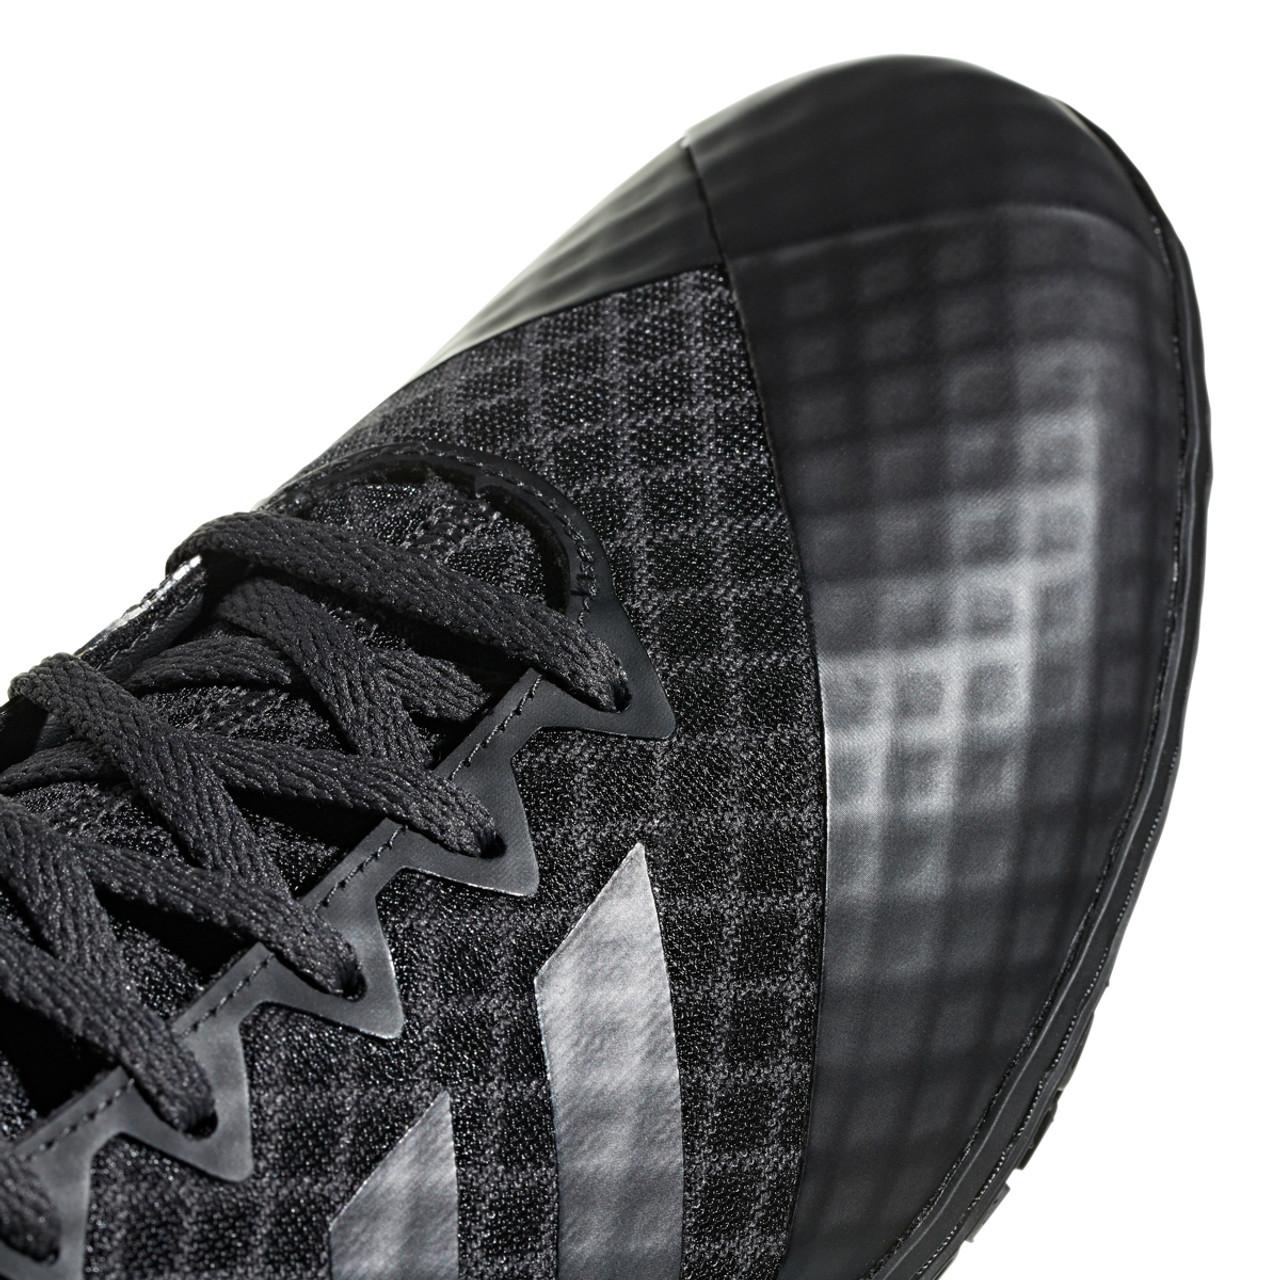 Adidas Mat Wizard 4 Men s Wrestling Shoes AC6971 - Carbon 6a89bb4d1